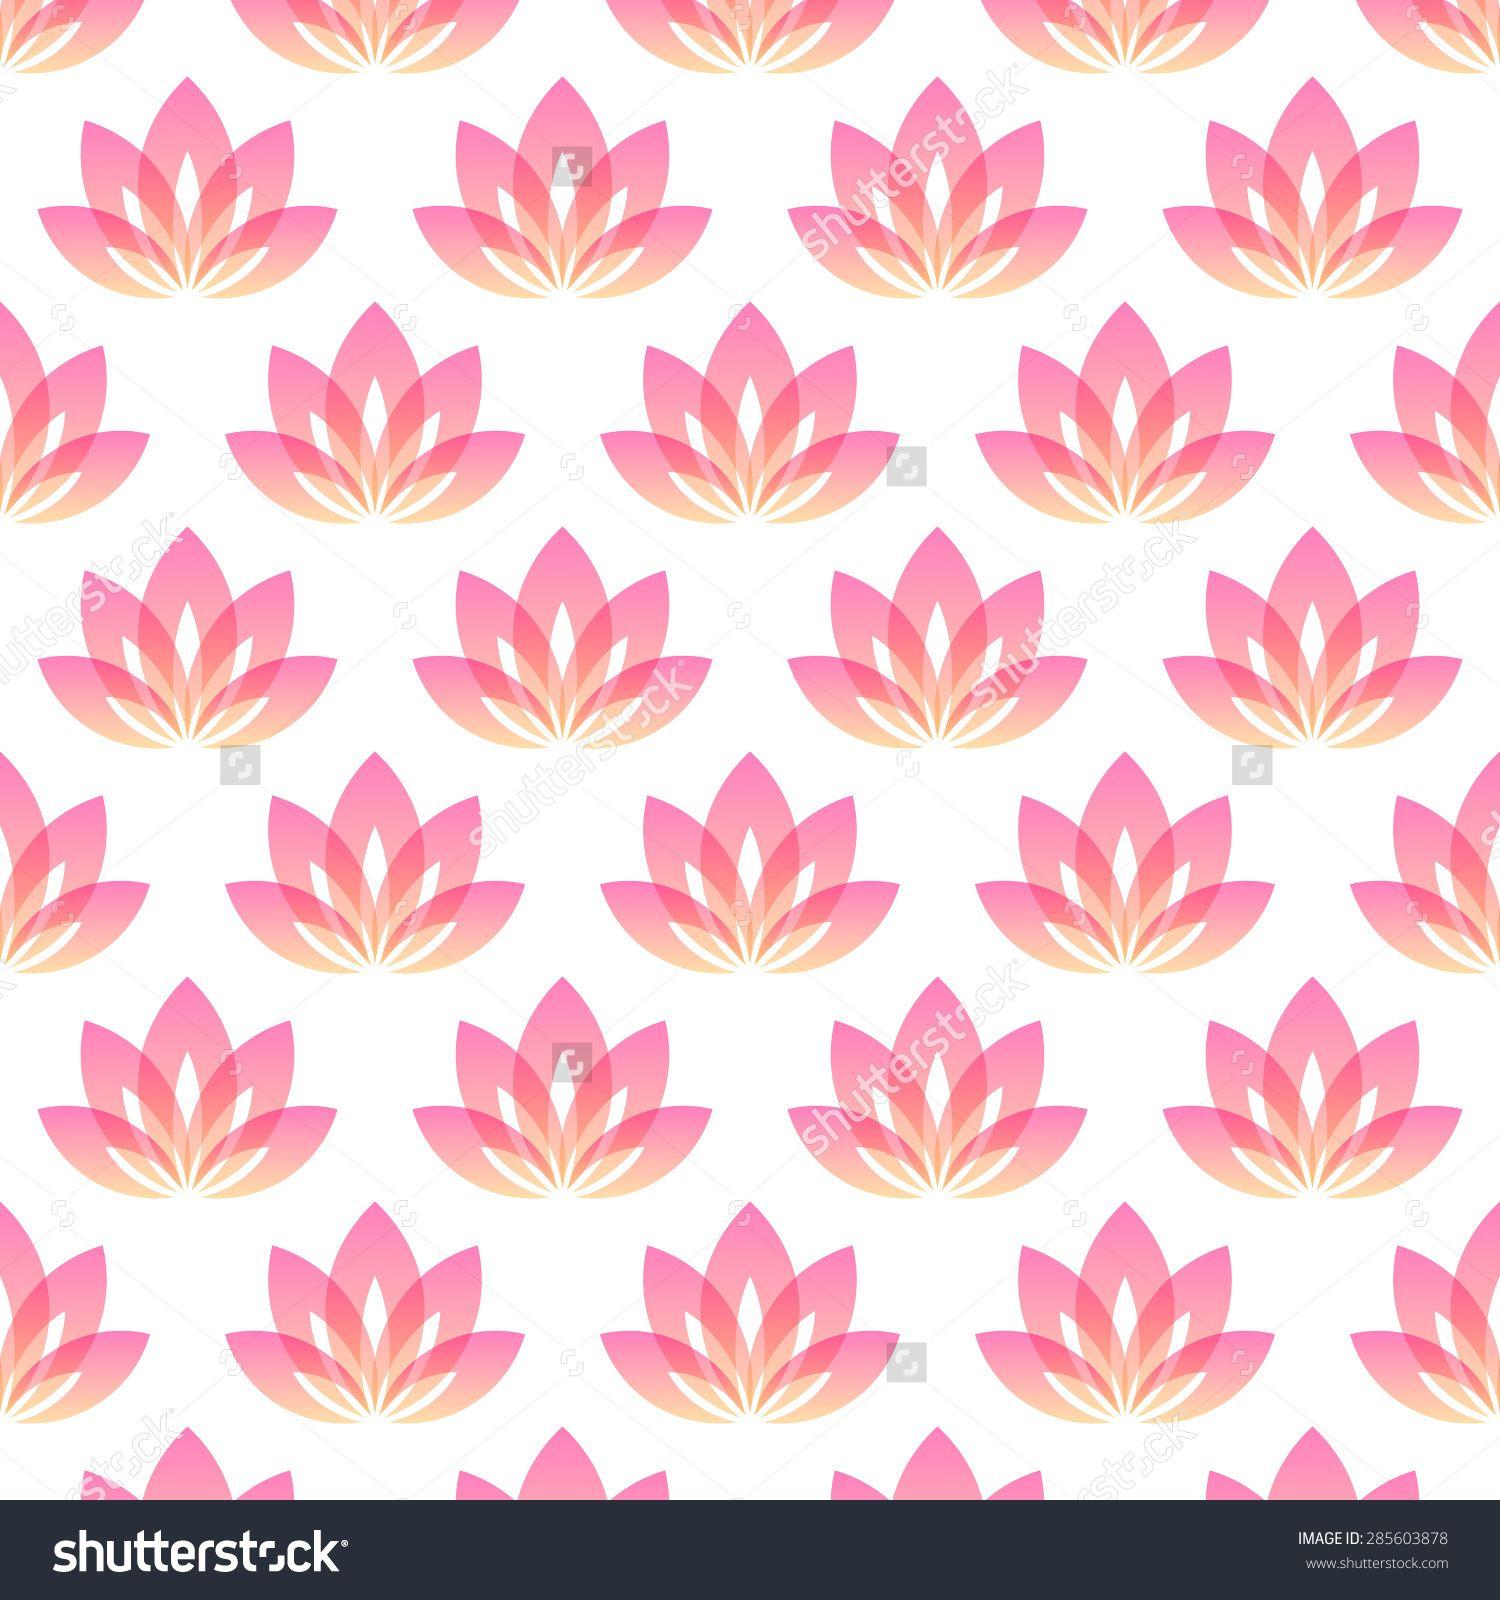 2b8f80b75cd9102ab20b21f0c1ae8df4save to a lightbox lotus flower 2b8f80b75cd9102ab20b21f0c1ae8df4save to a lightbox lotus flower pattern clipart1500 1600eg 15001600 izmirmasajfo